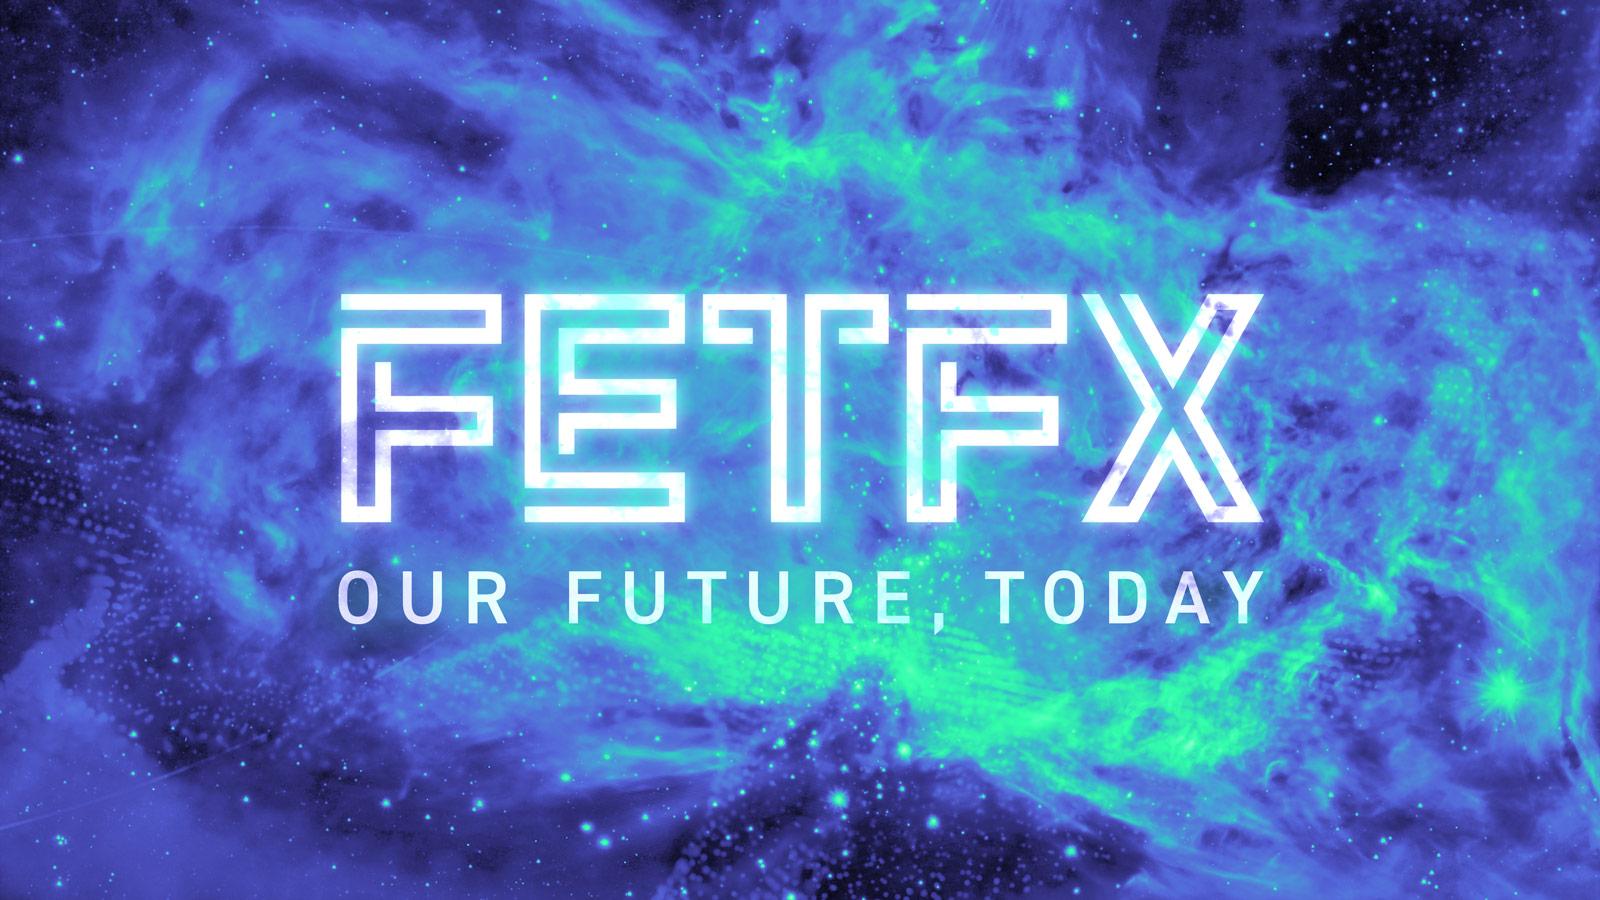 FETFX